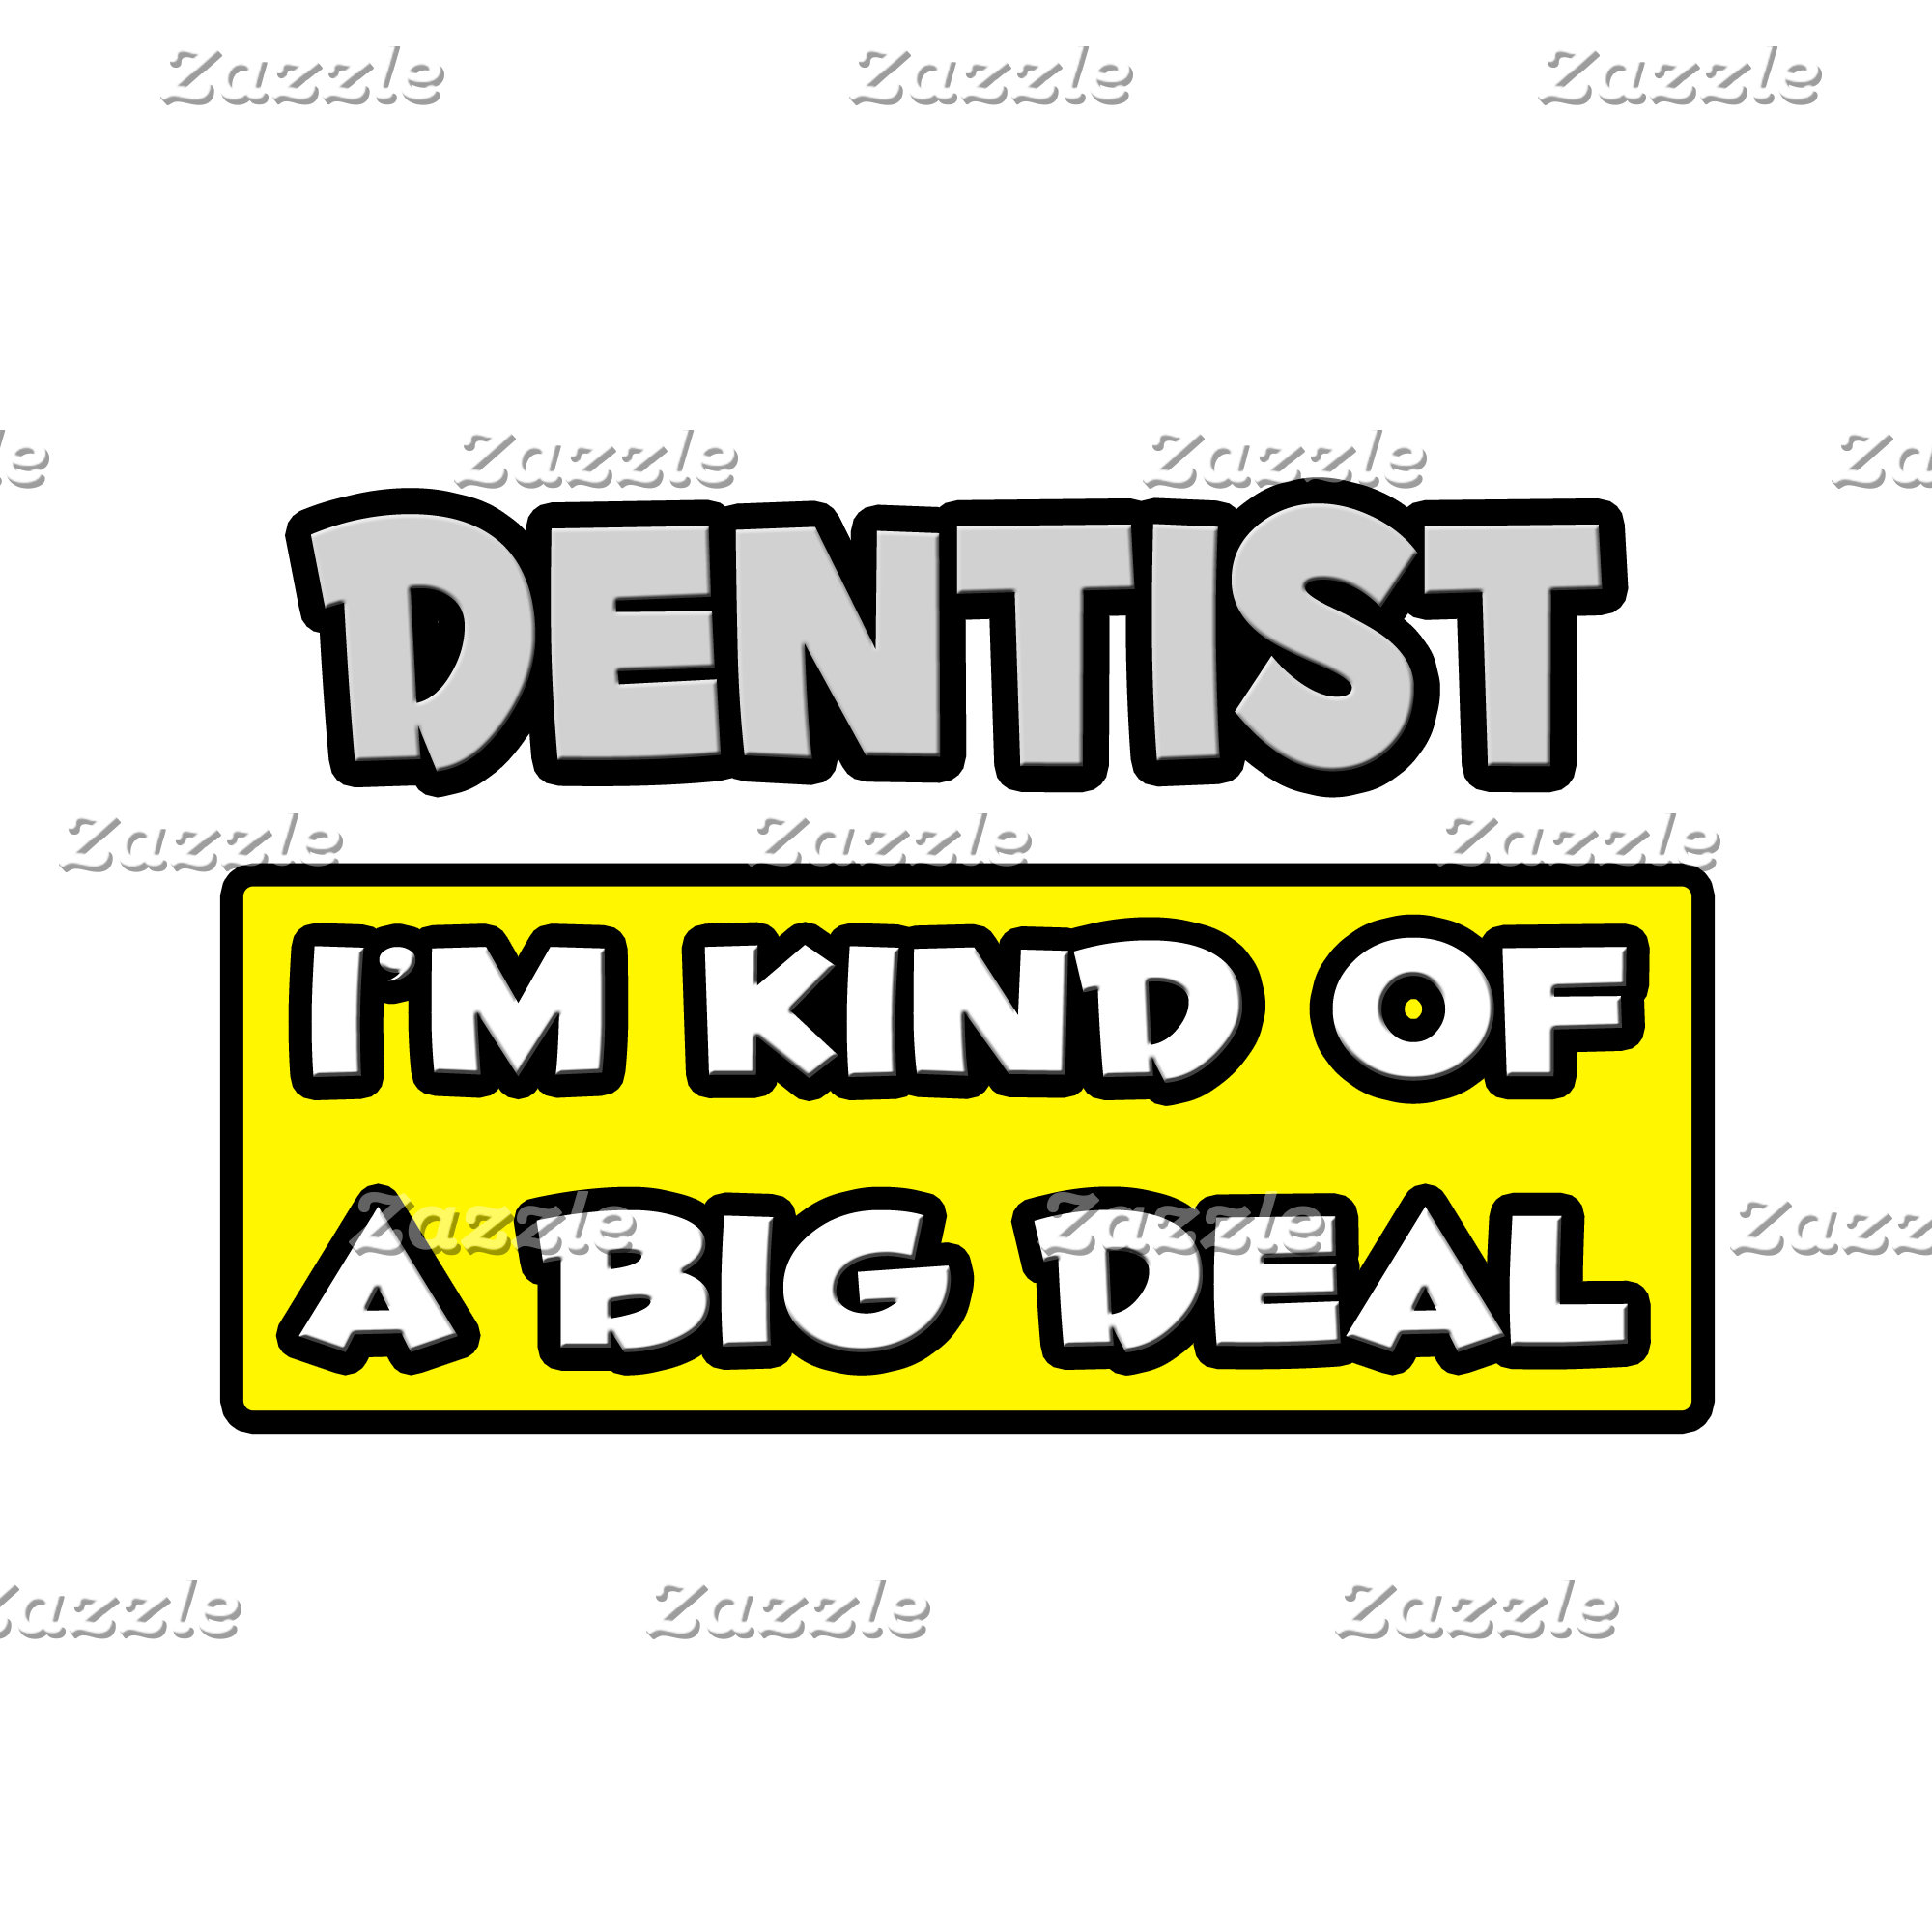 Dentist .. I'm Kind of a Big Deal